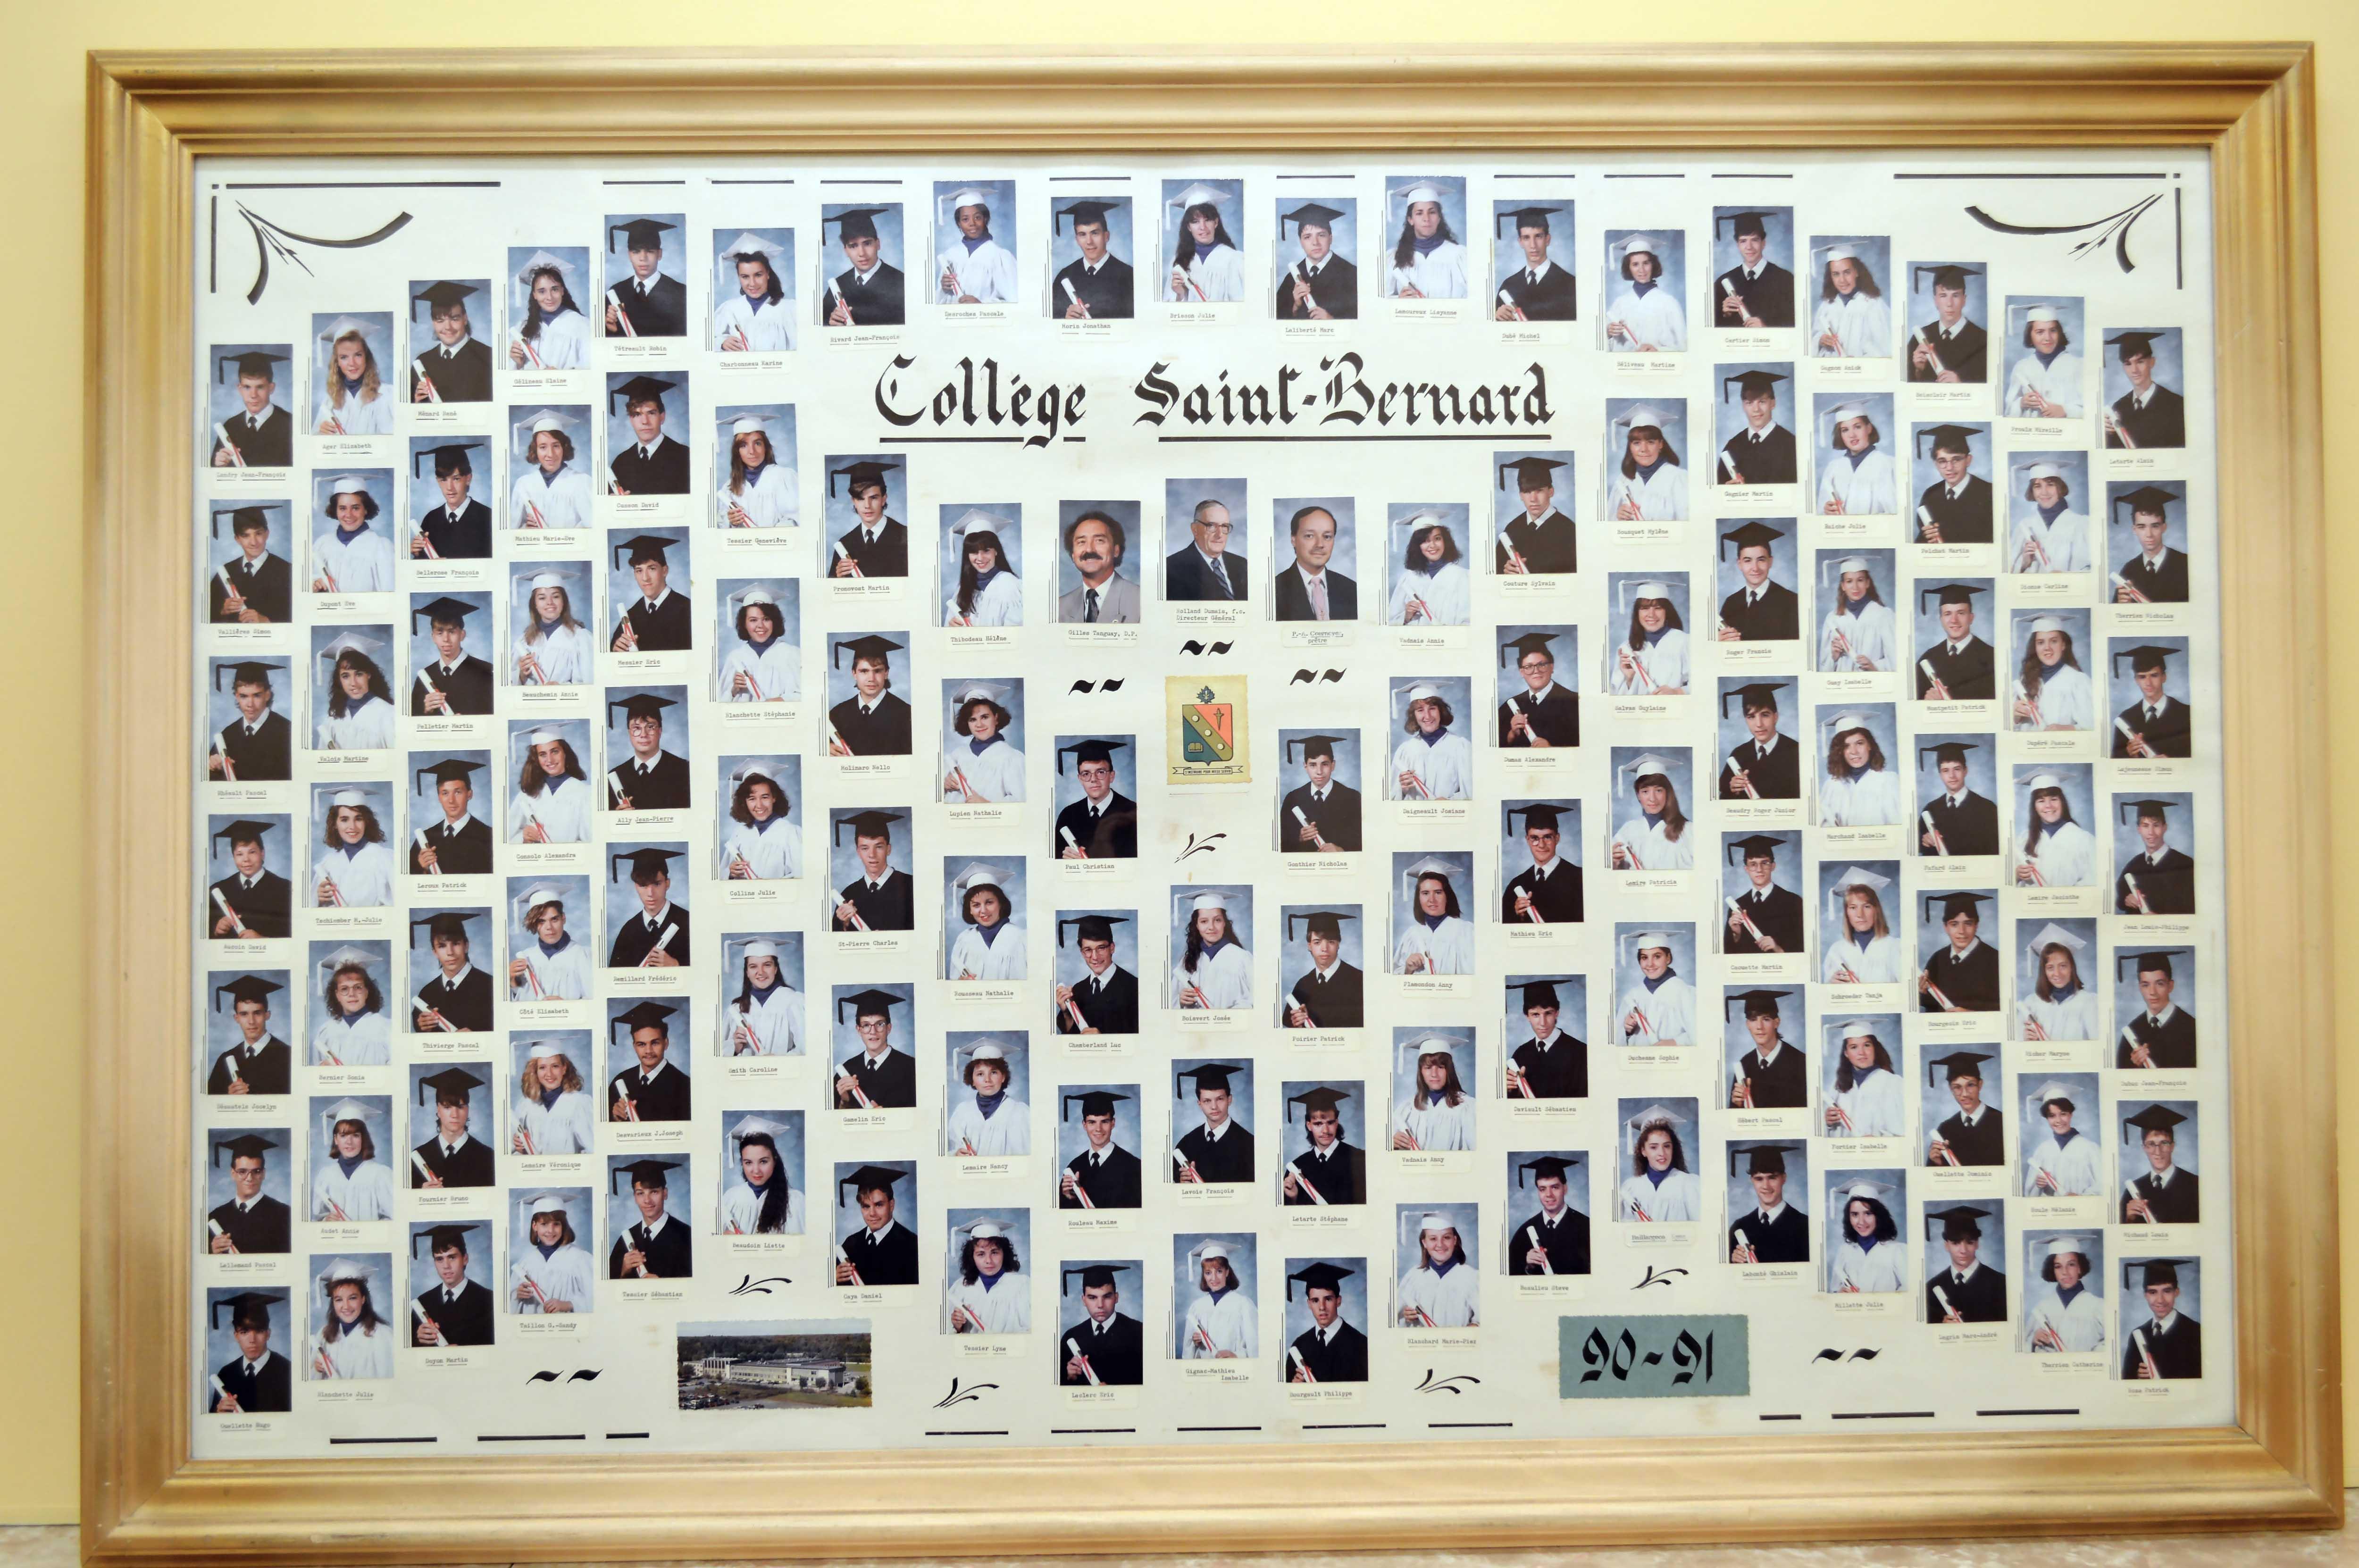 College-Saint-Bernard_Graduations-1990-91